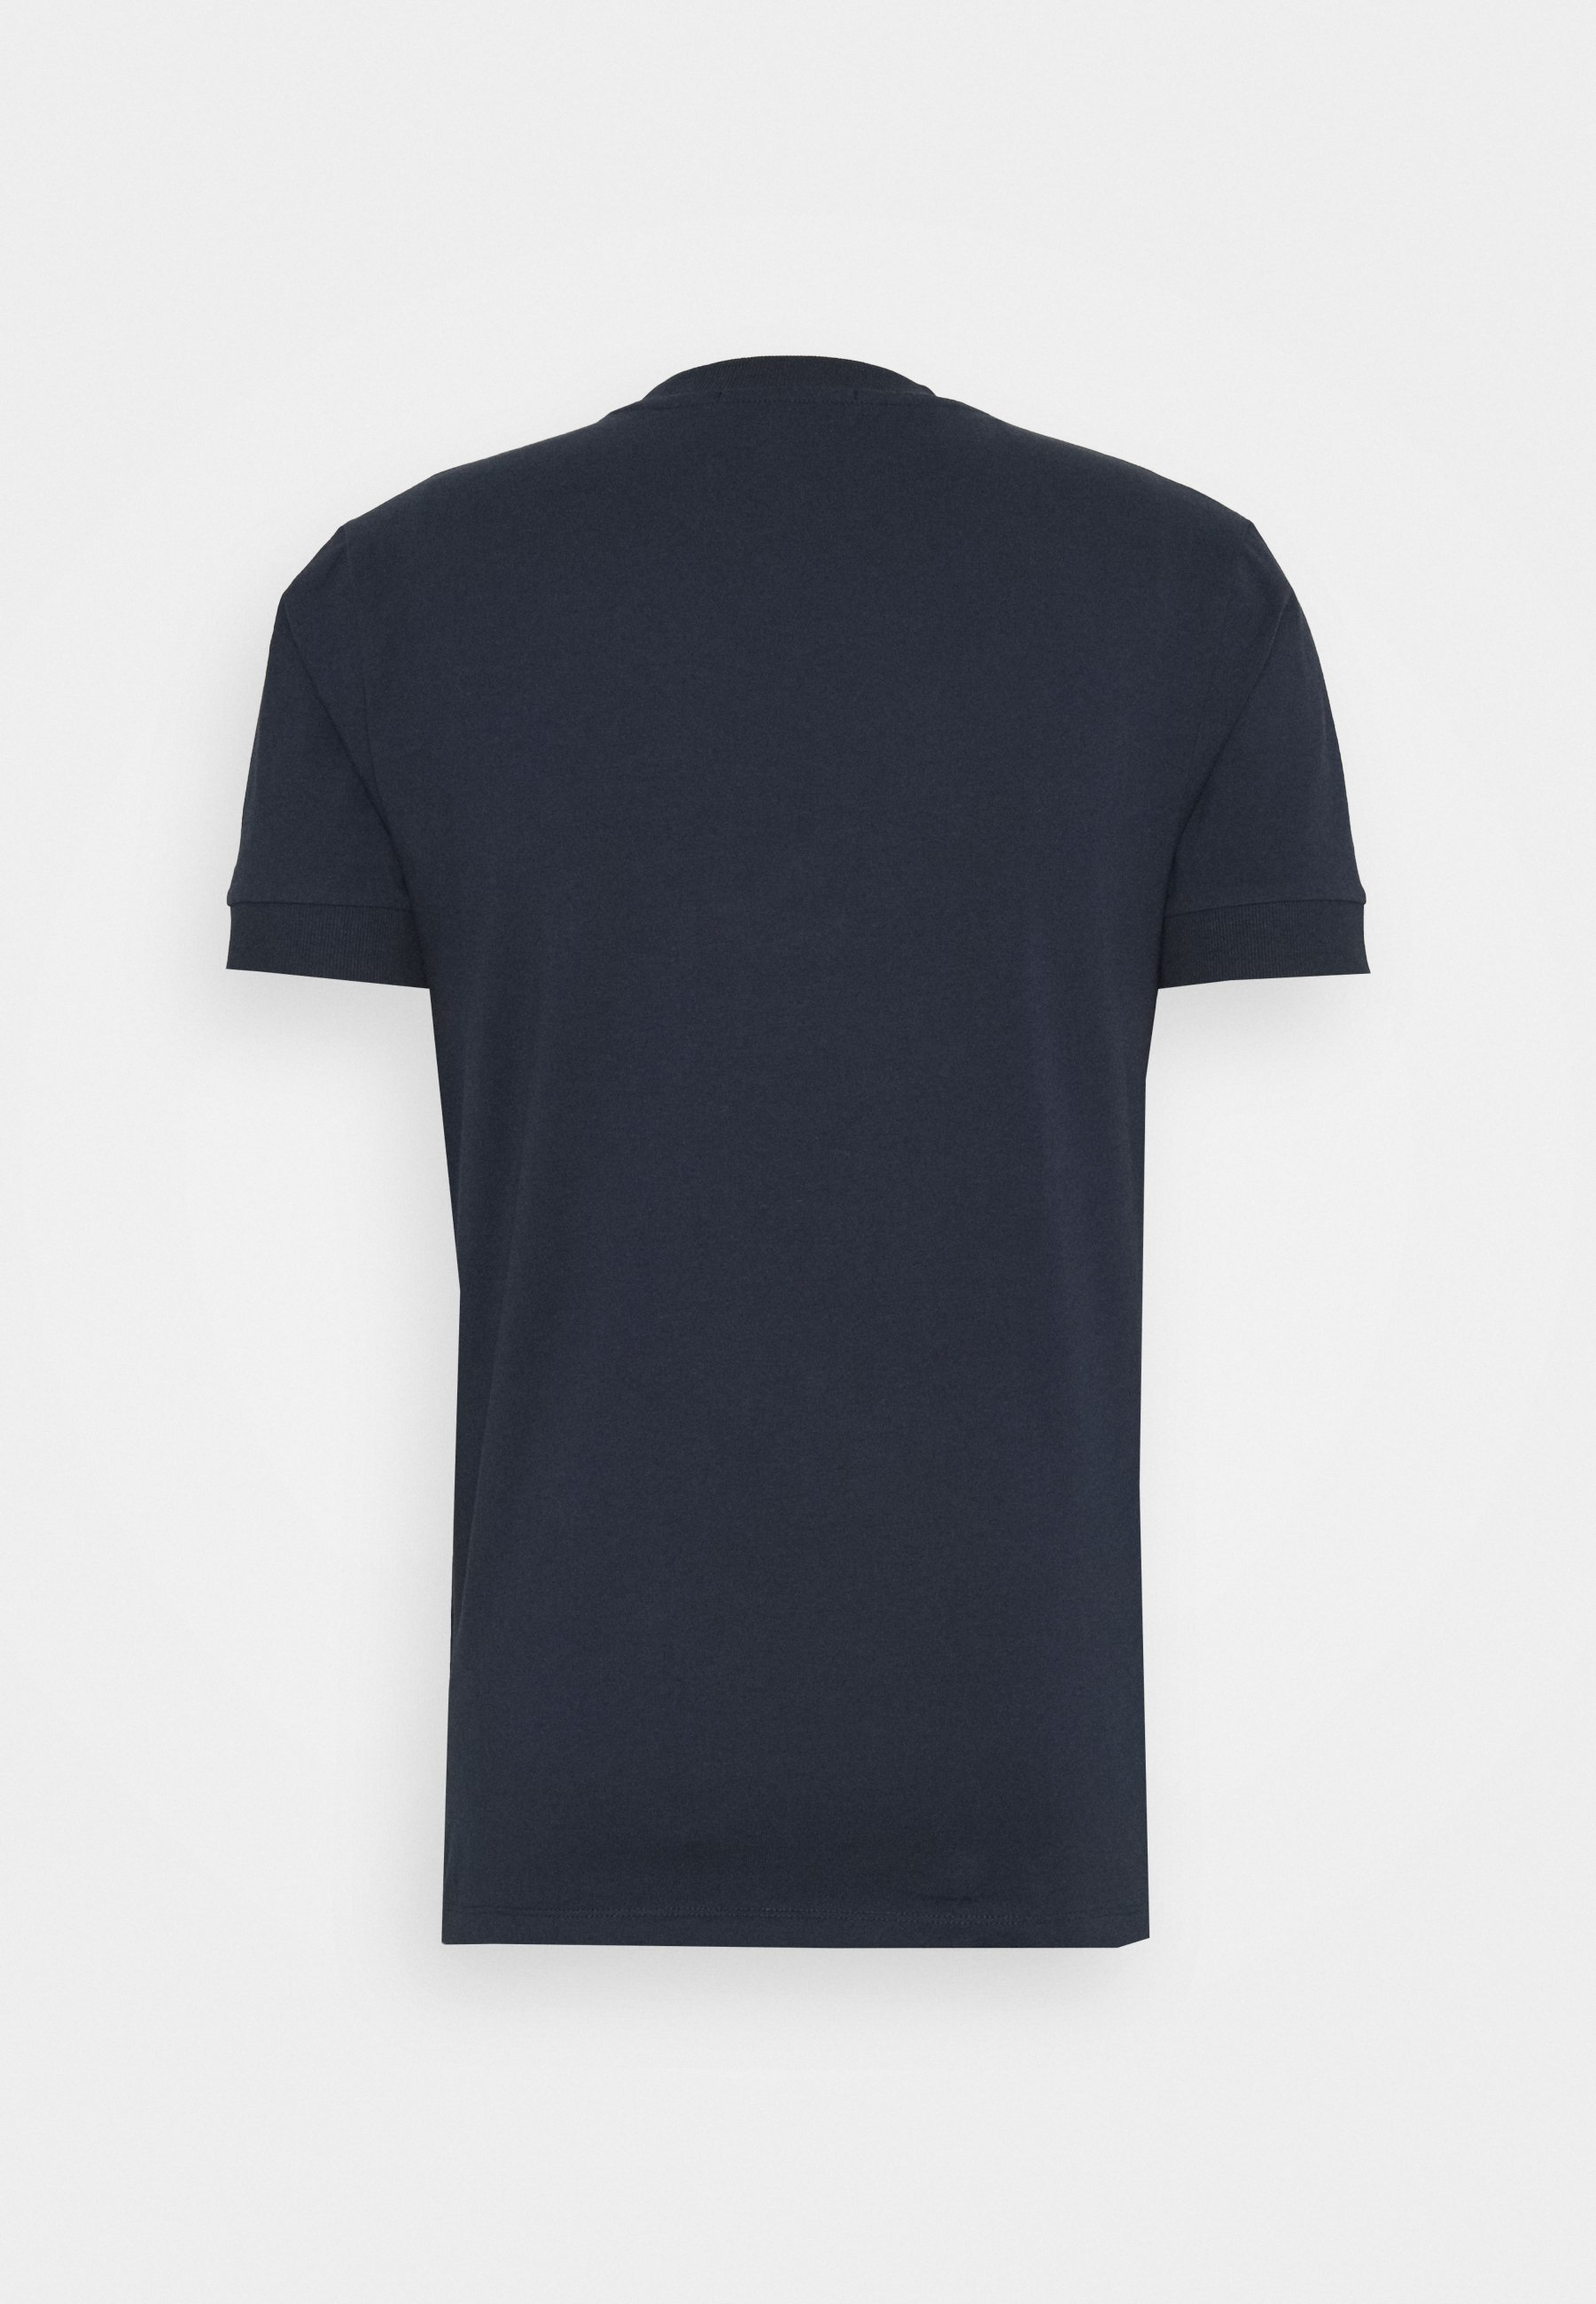 Homme ANTON - T-shirt basique - dark blue